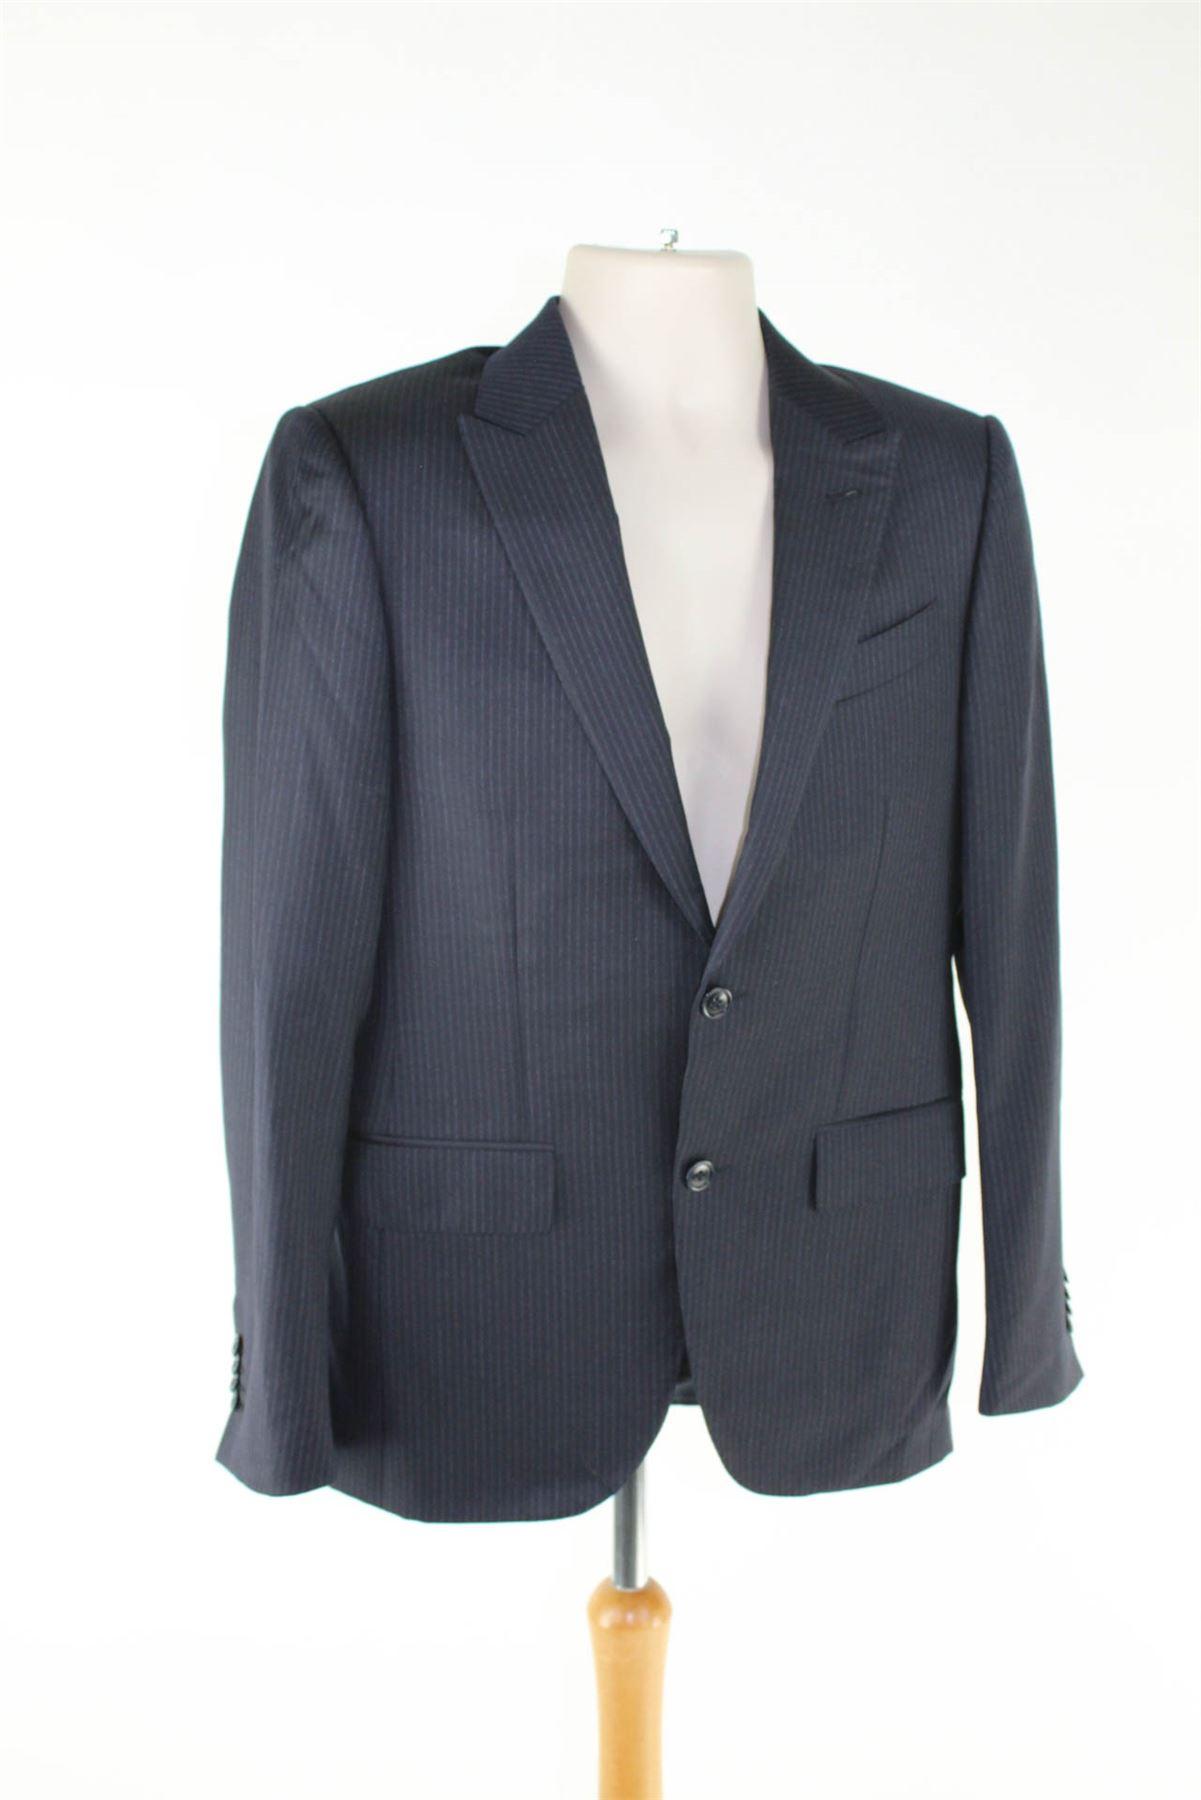 Dettagli su ERMENEGILDO ZEGNA Torin Navy a strisce blu di lana Suit 0aa80765d08